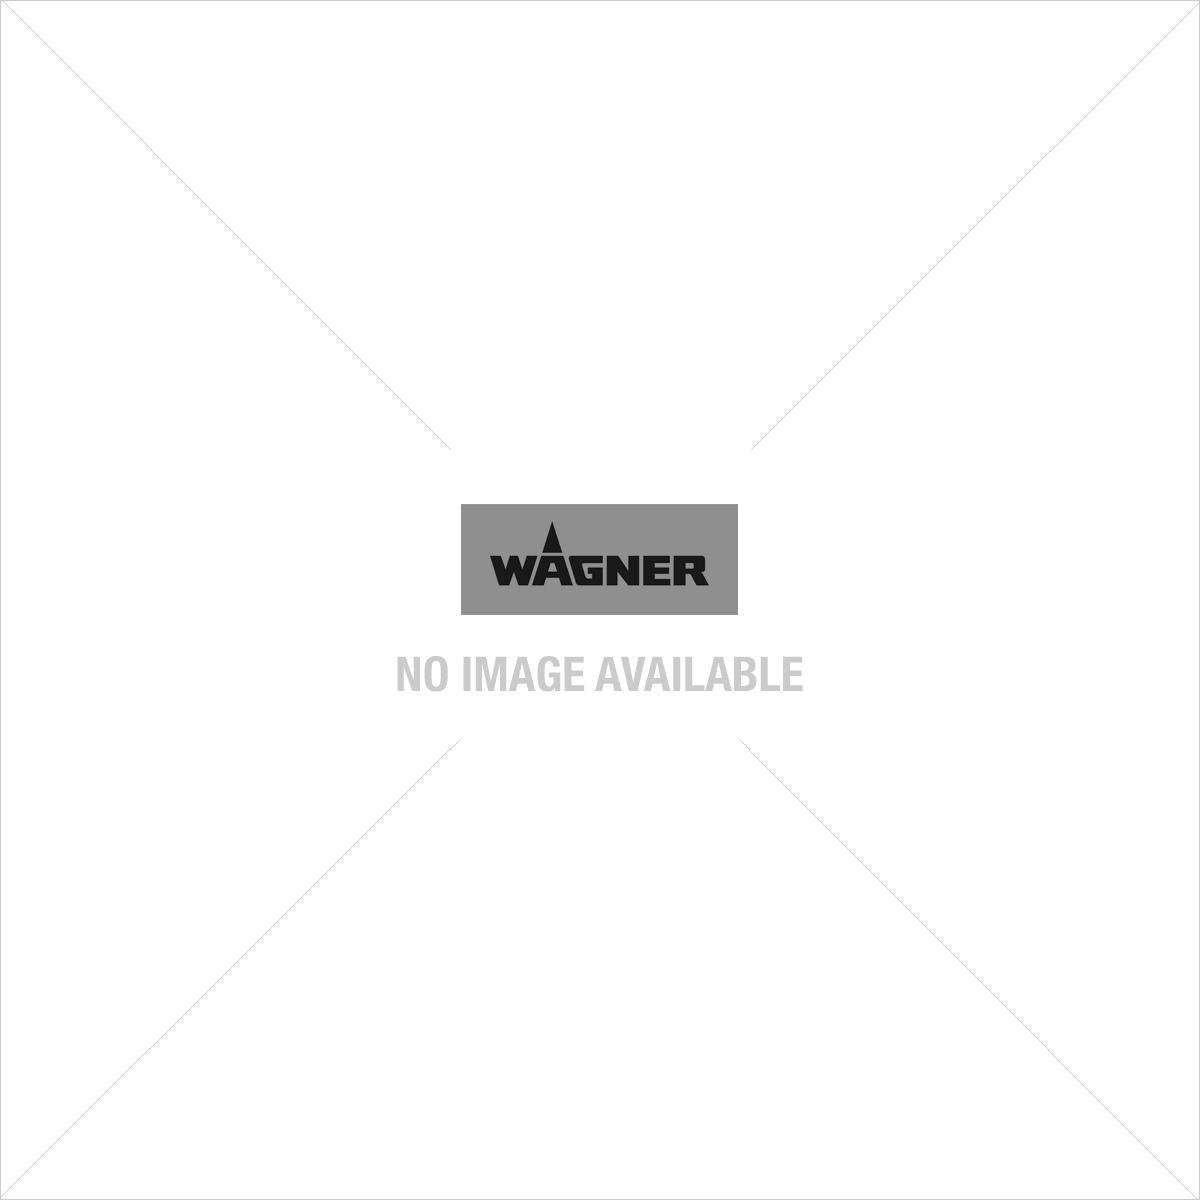 Wagner Project Pro 117 Airless Farbsprühsystem